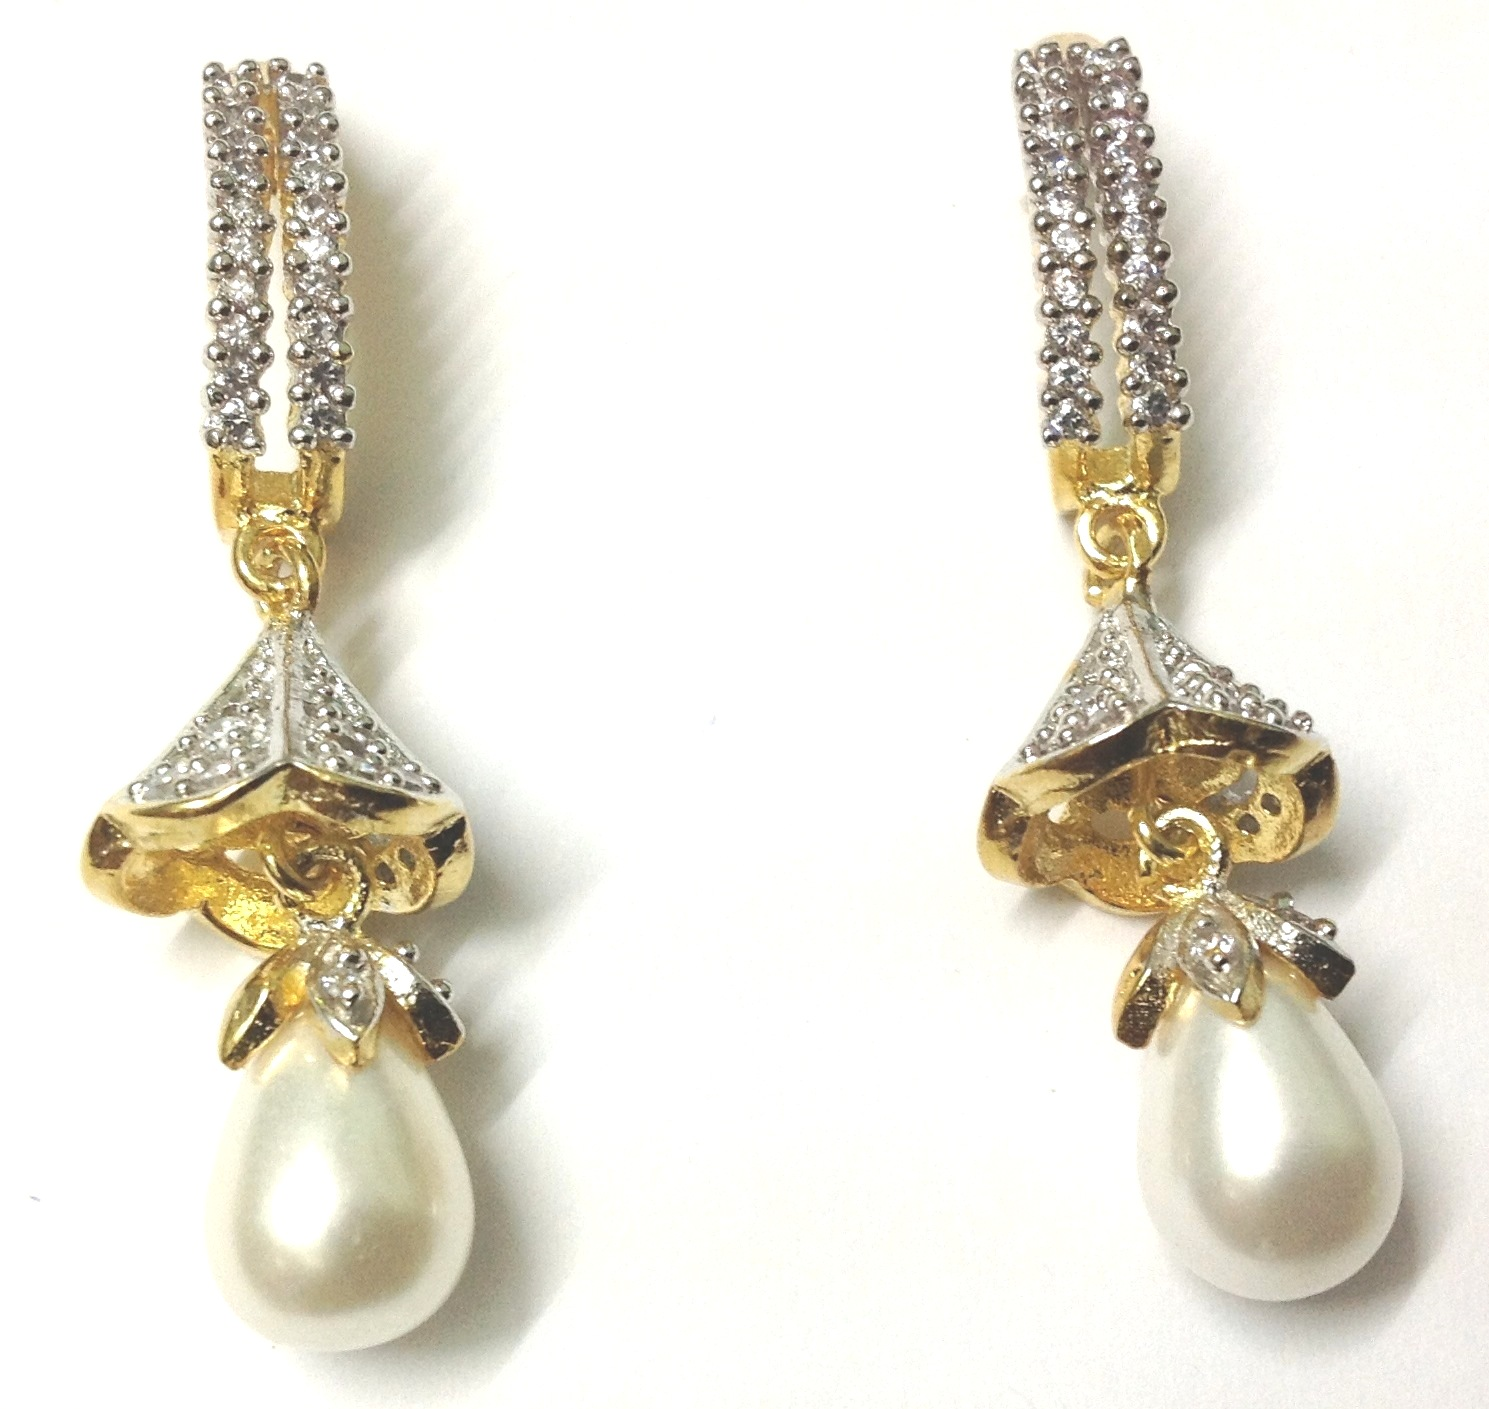 exclusive imitation jewellery american diamond earrings. Black Bedroom Furniture Sets. Home Design Ideas